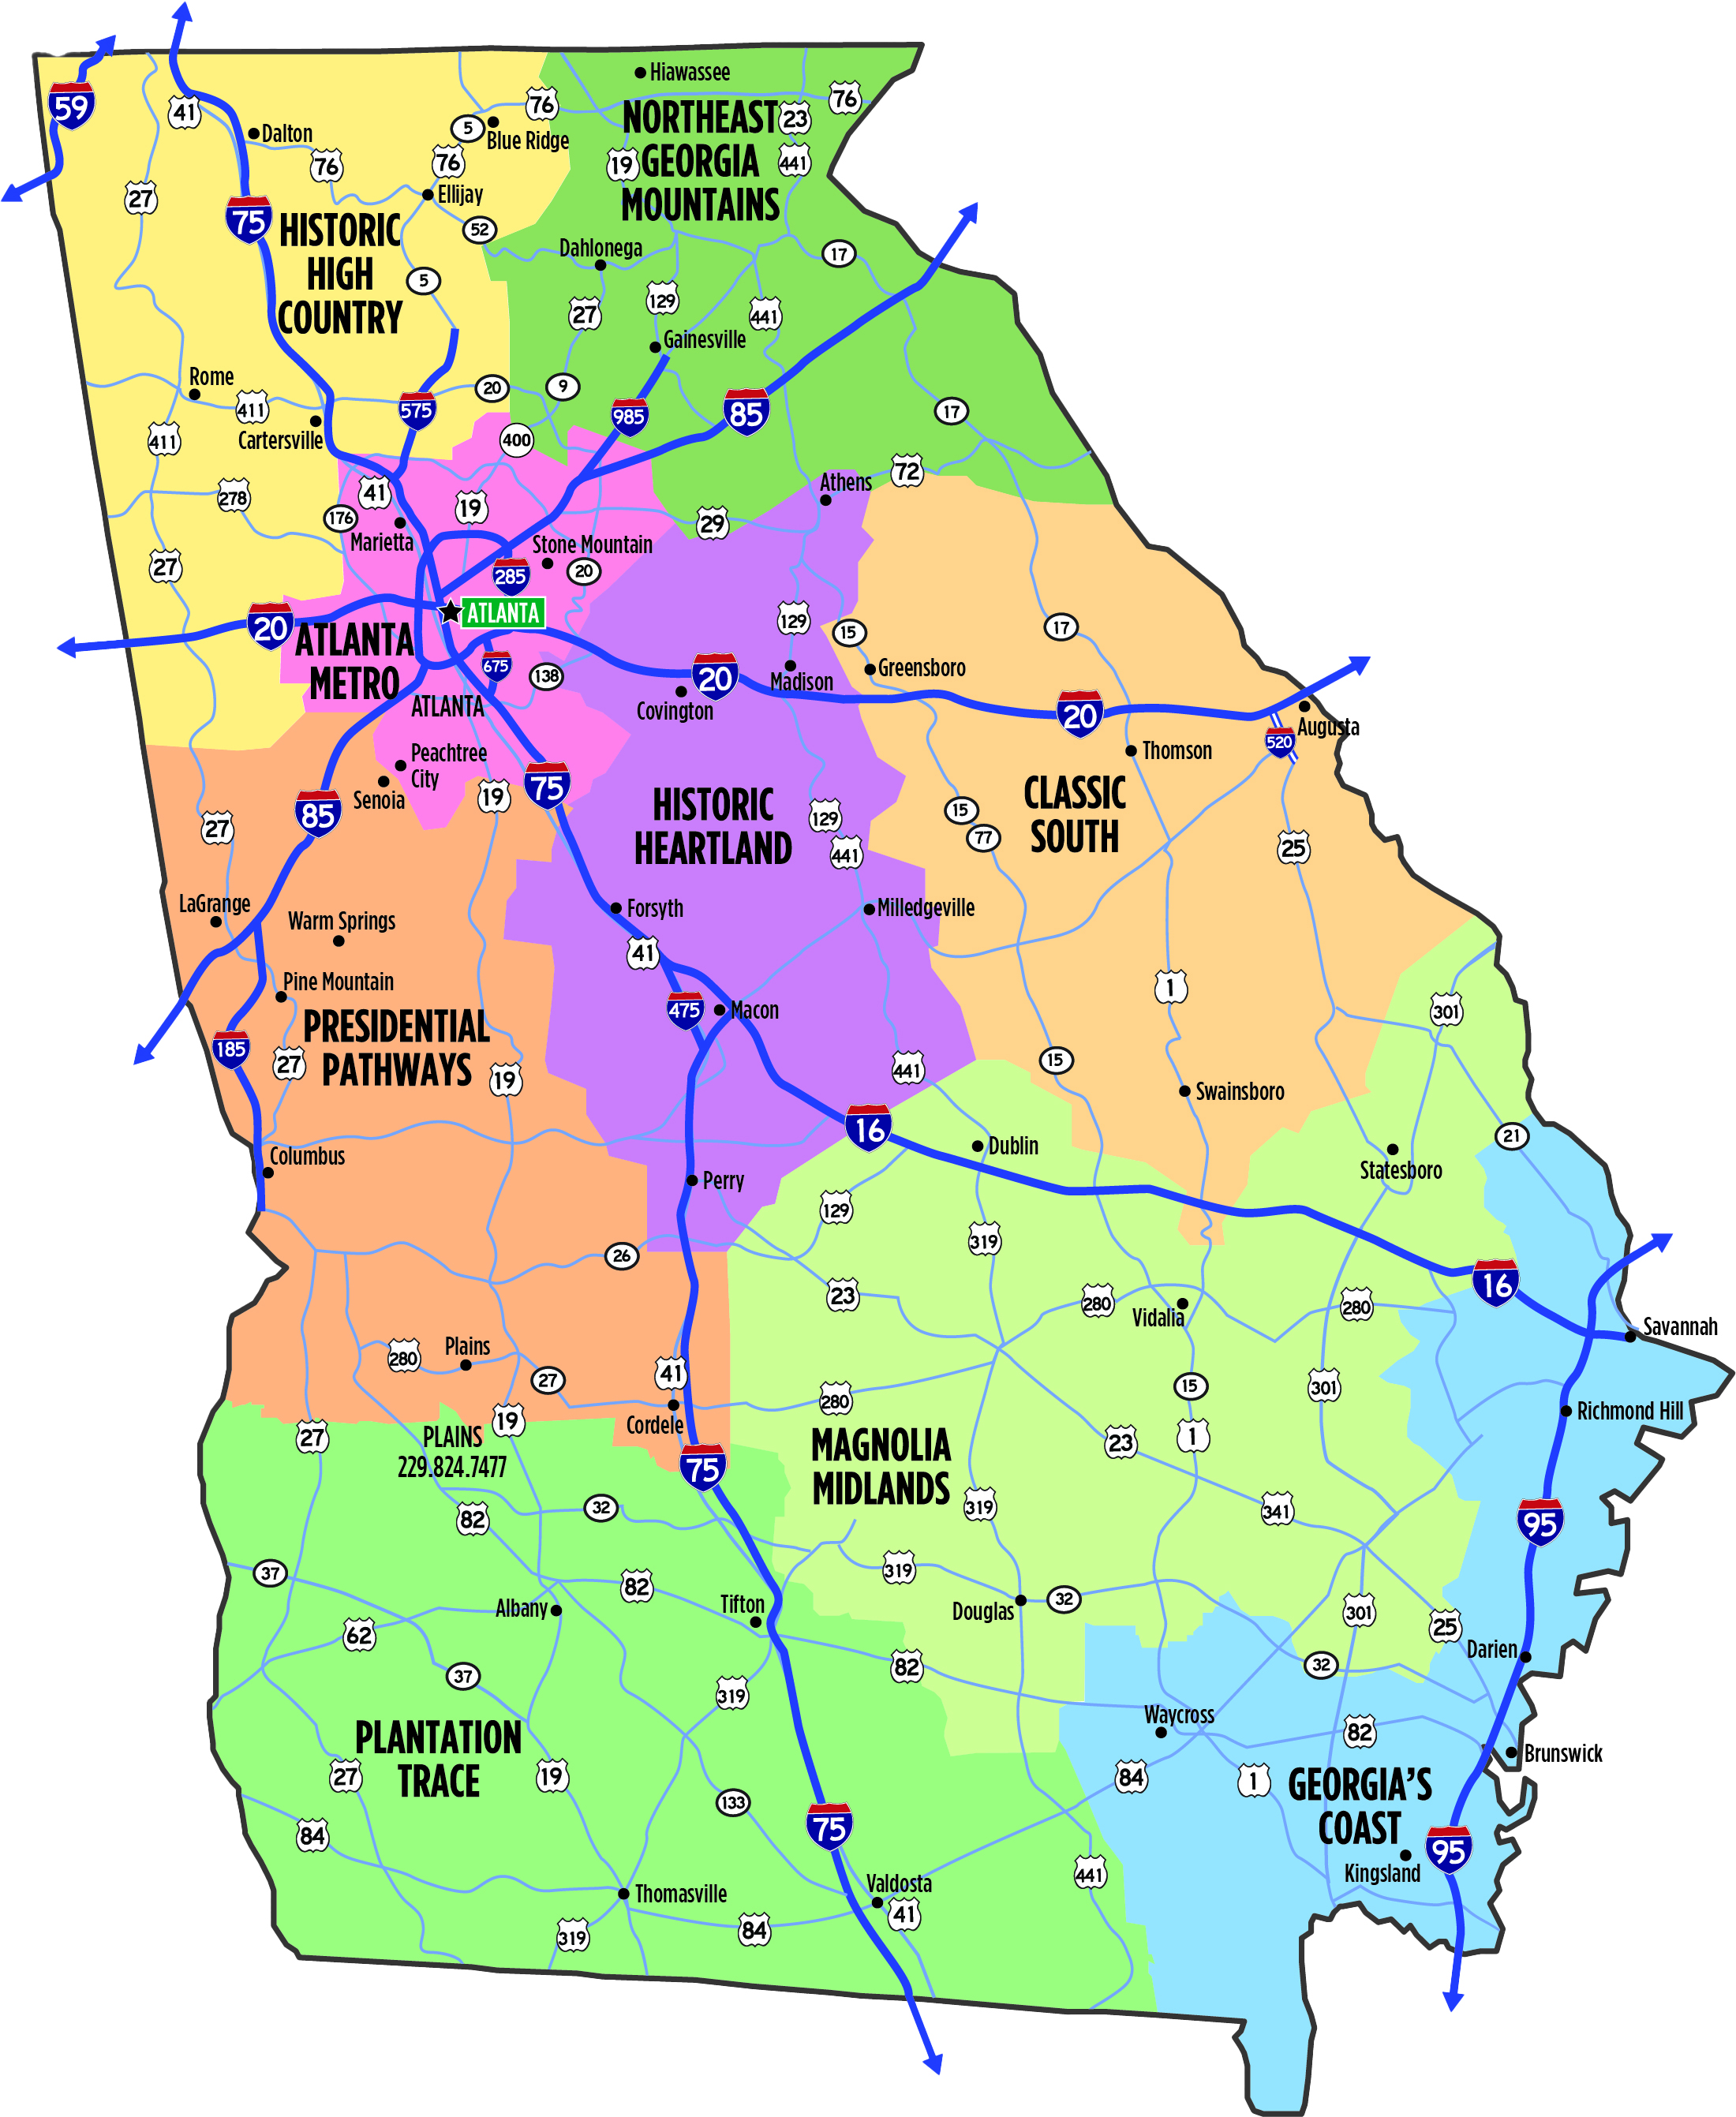 Tourism Region Map